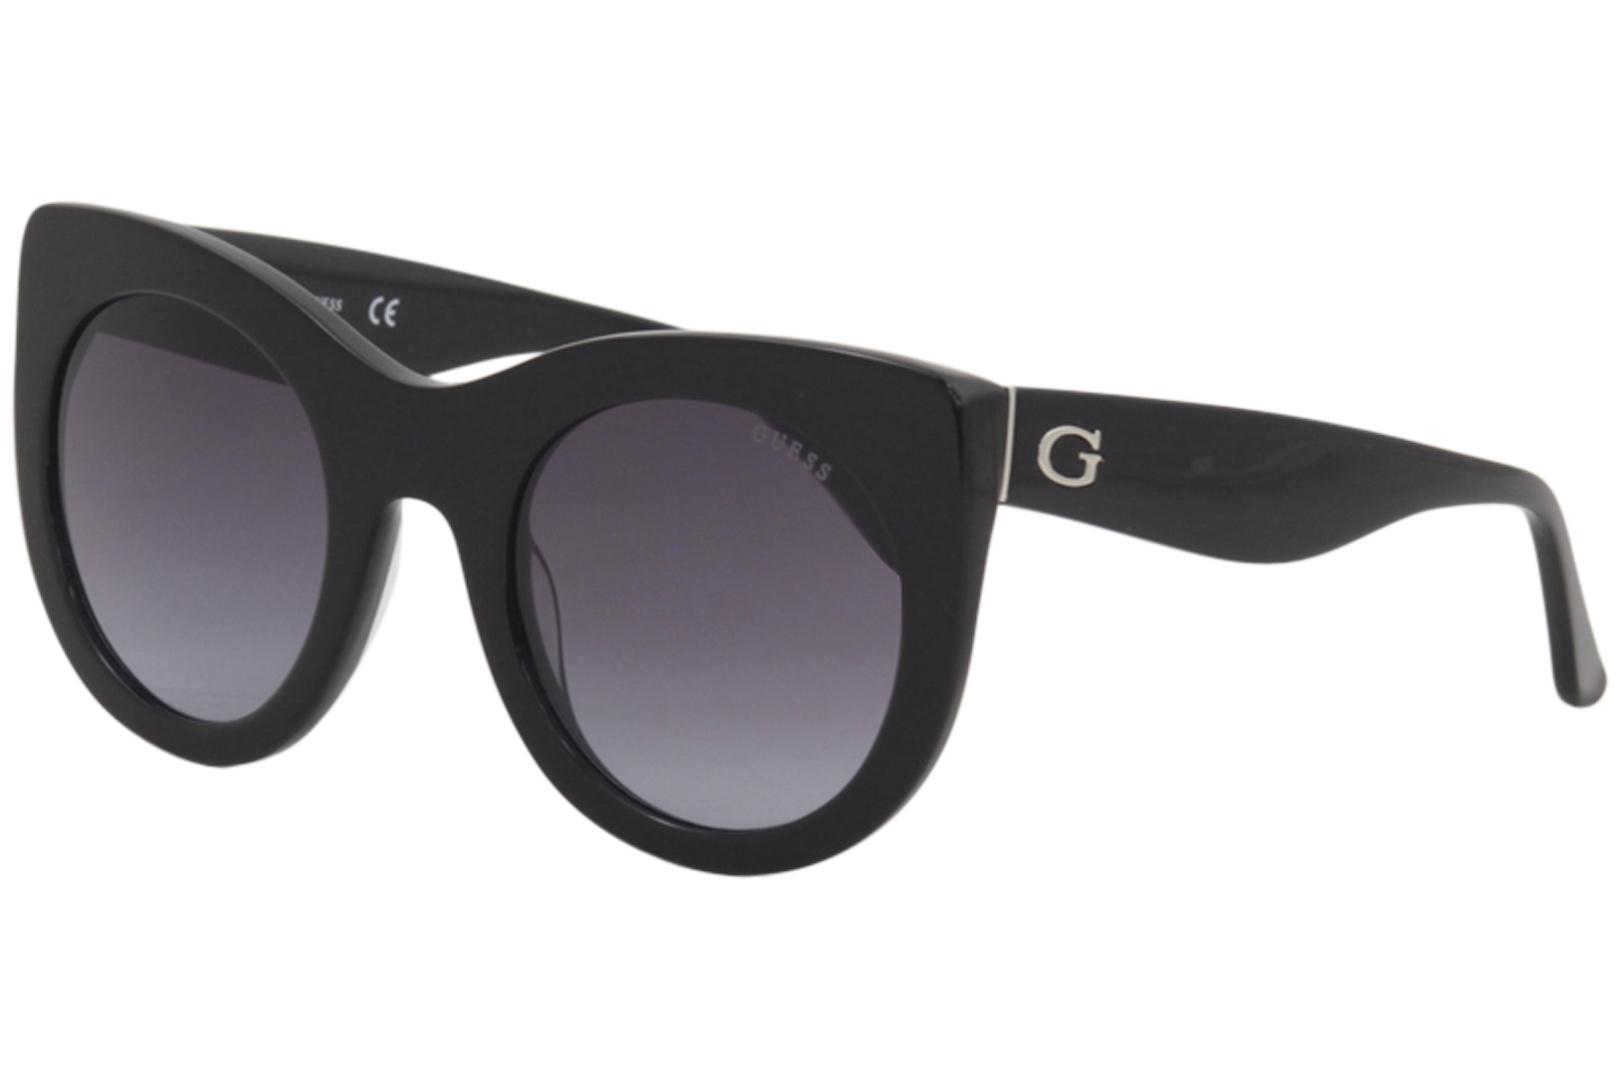 25379f92e3 Guess Women s GU7485 GU 7485 01B Black Fashion Cateye Sunglasses ...